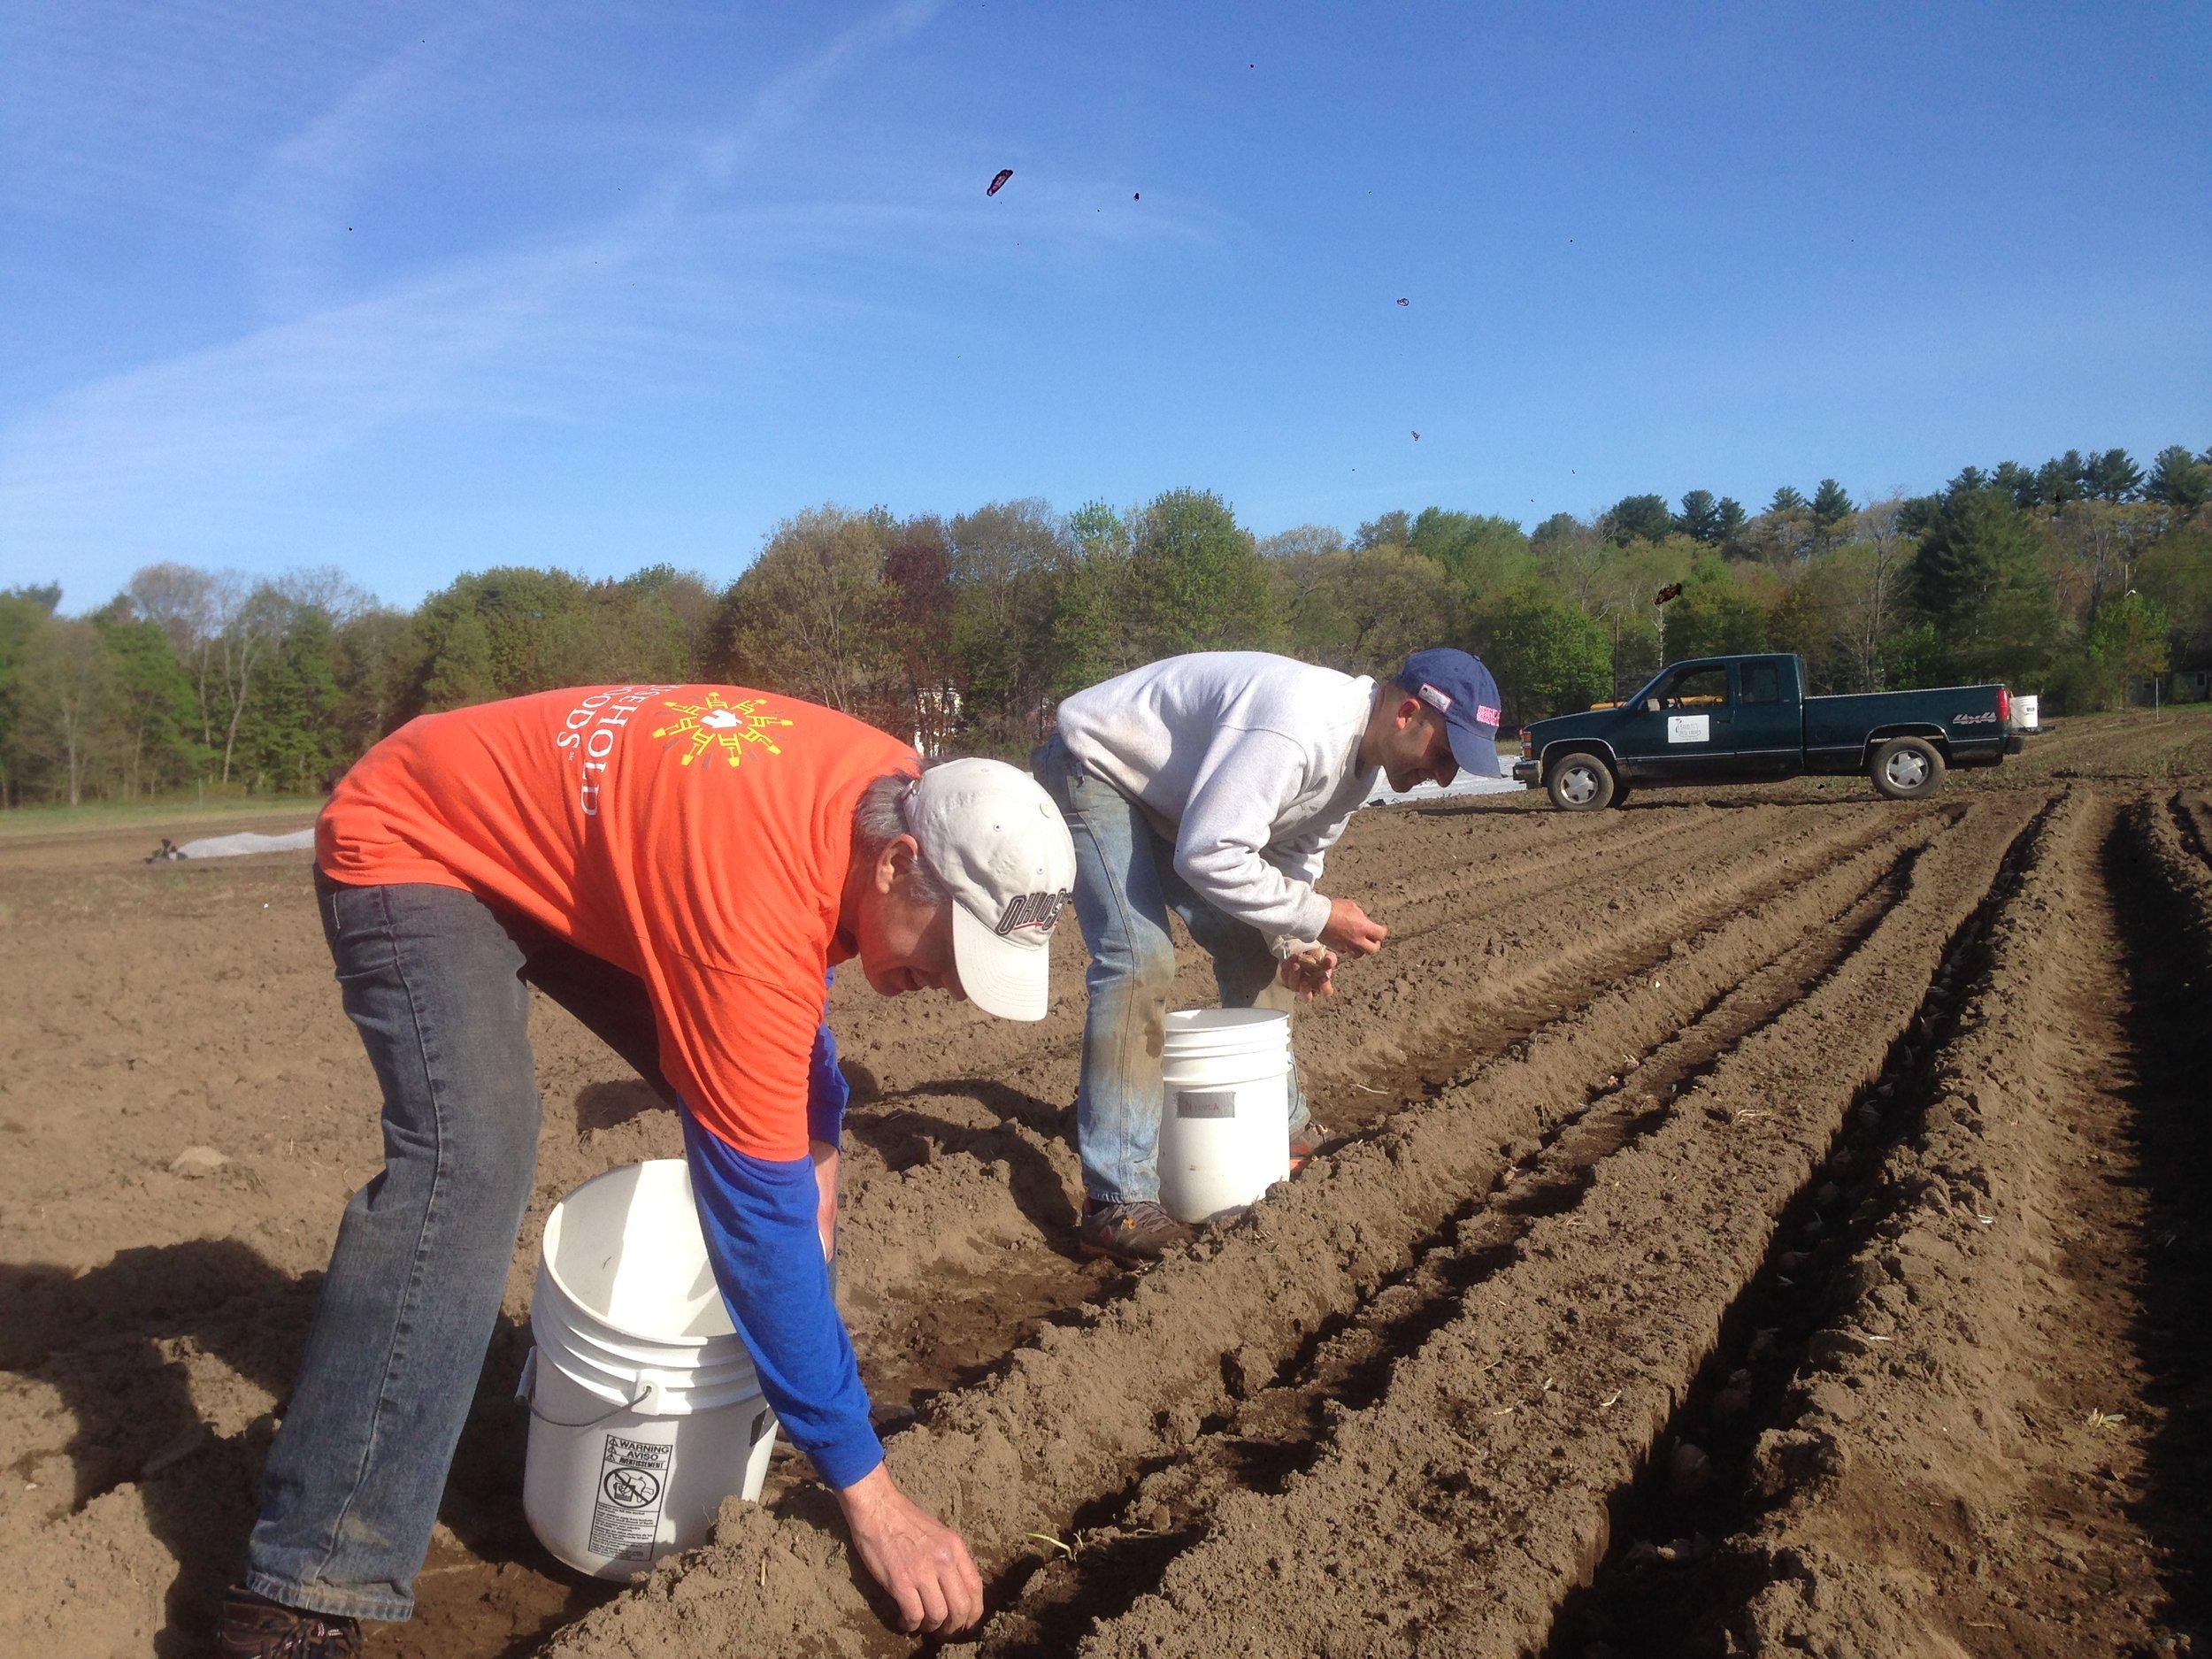 Dave and Shaun planting potatoes